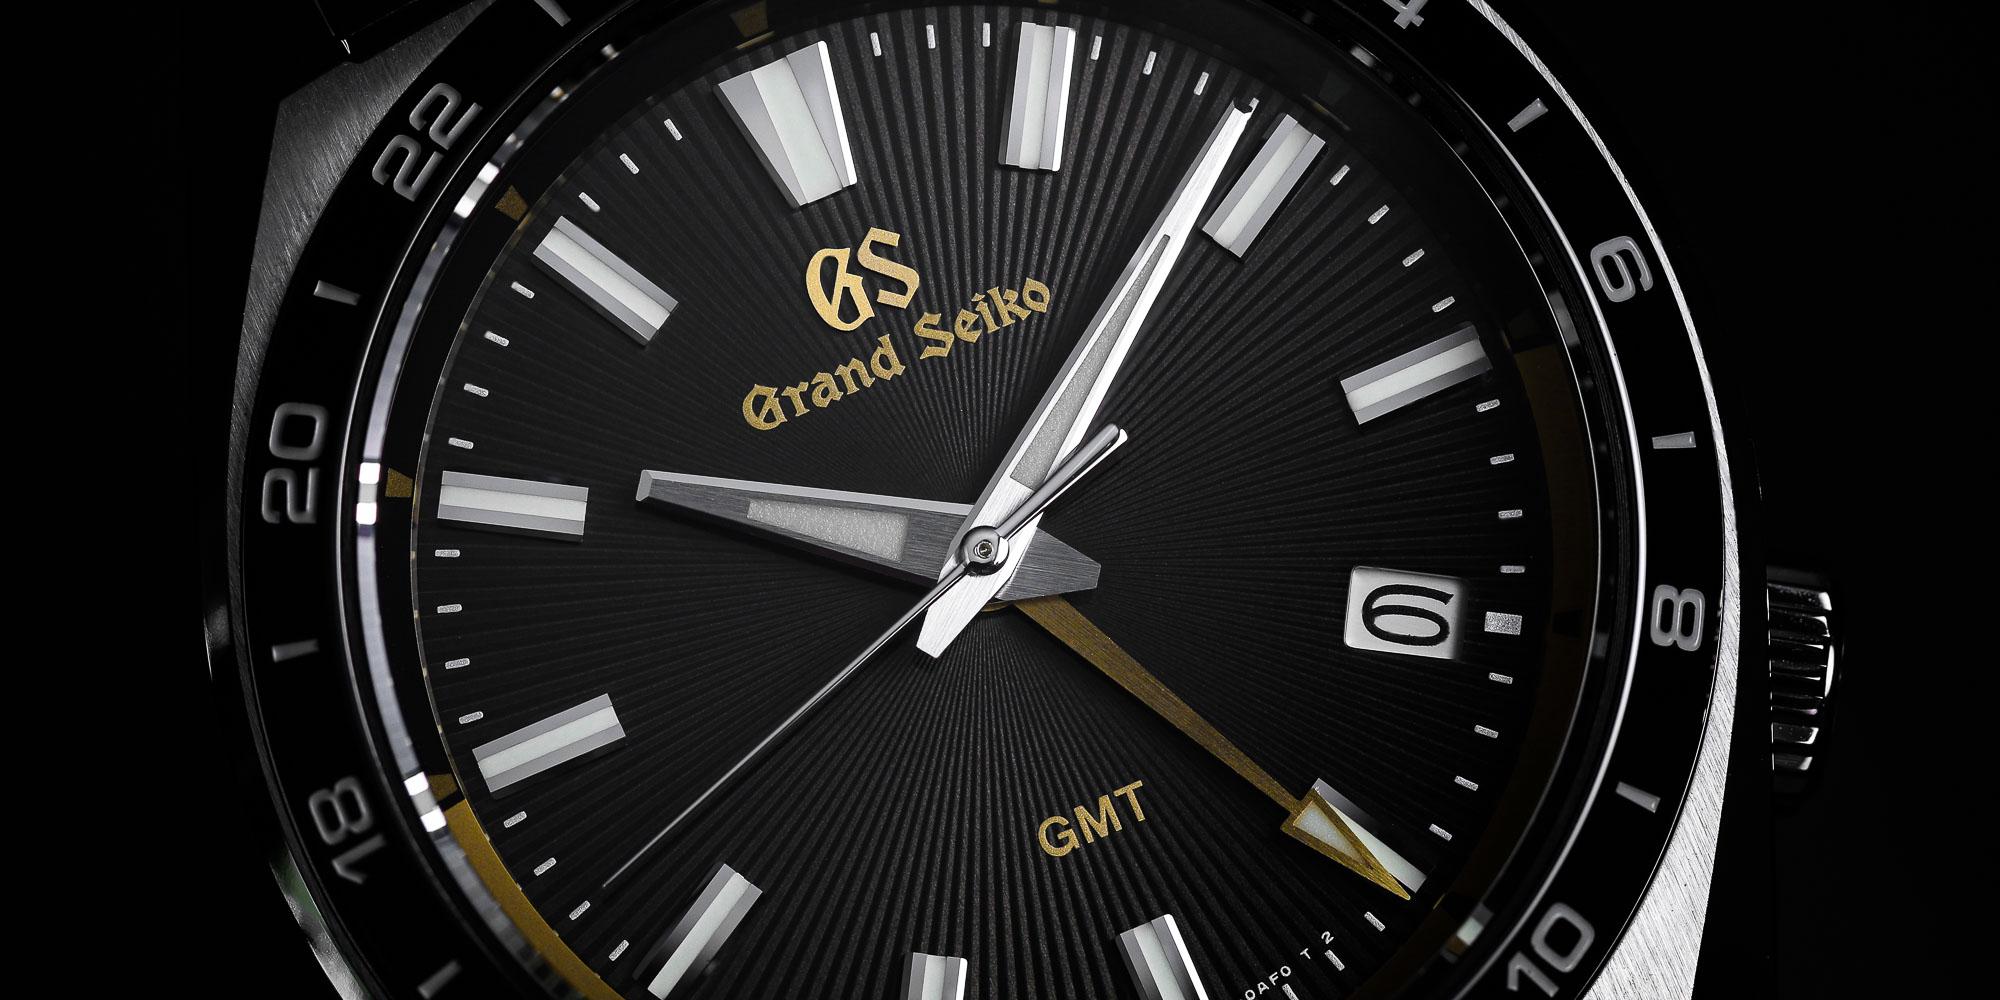 Closeup dial detail of Grand Seiko SBGN023